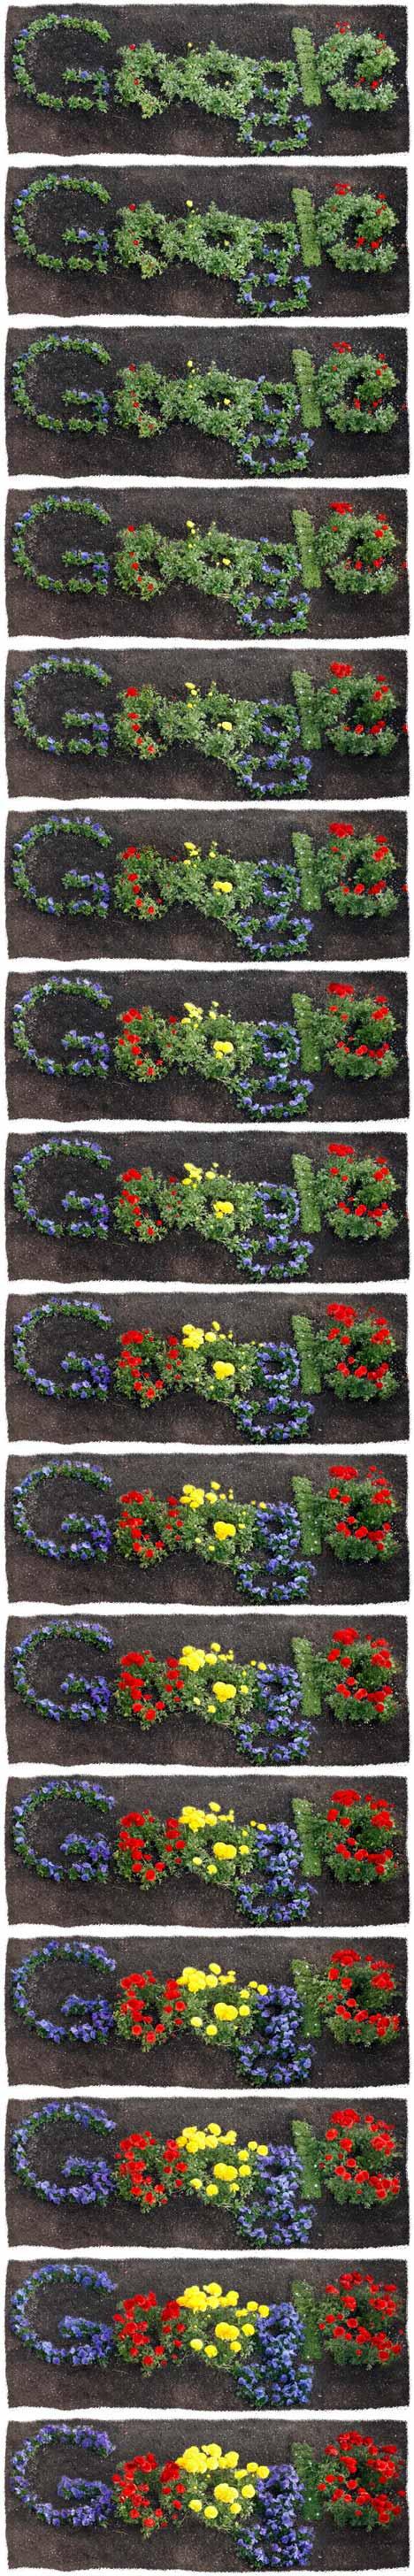 Les logos de Google - Page 6 Earthday12-hp-b